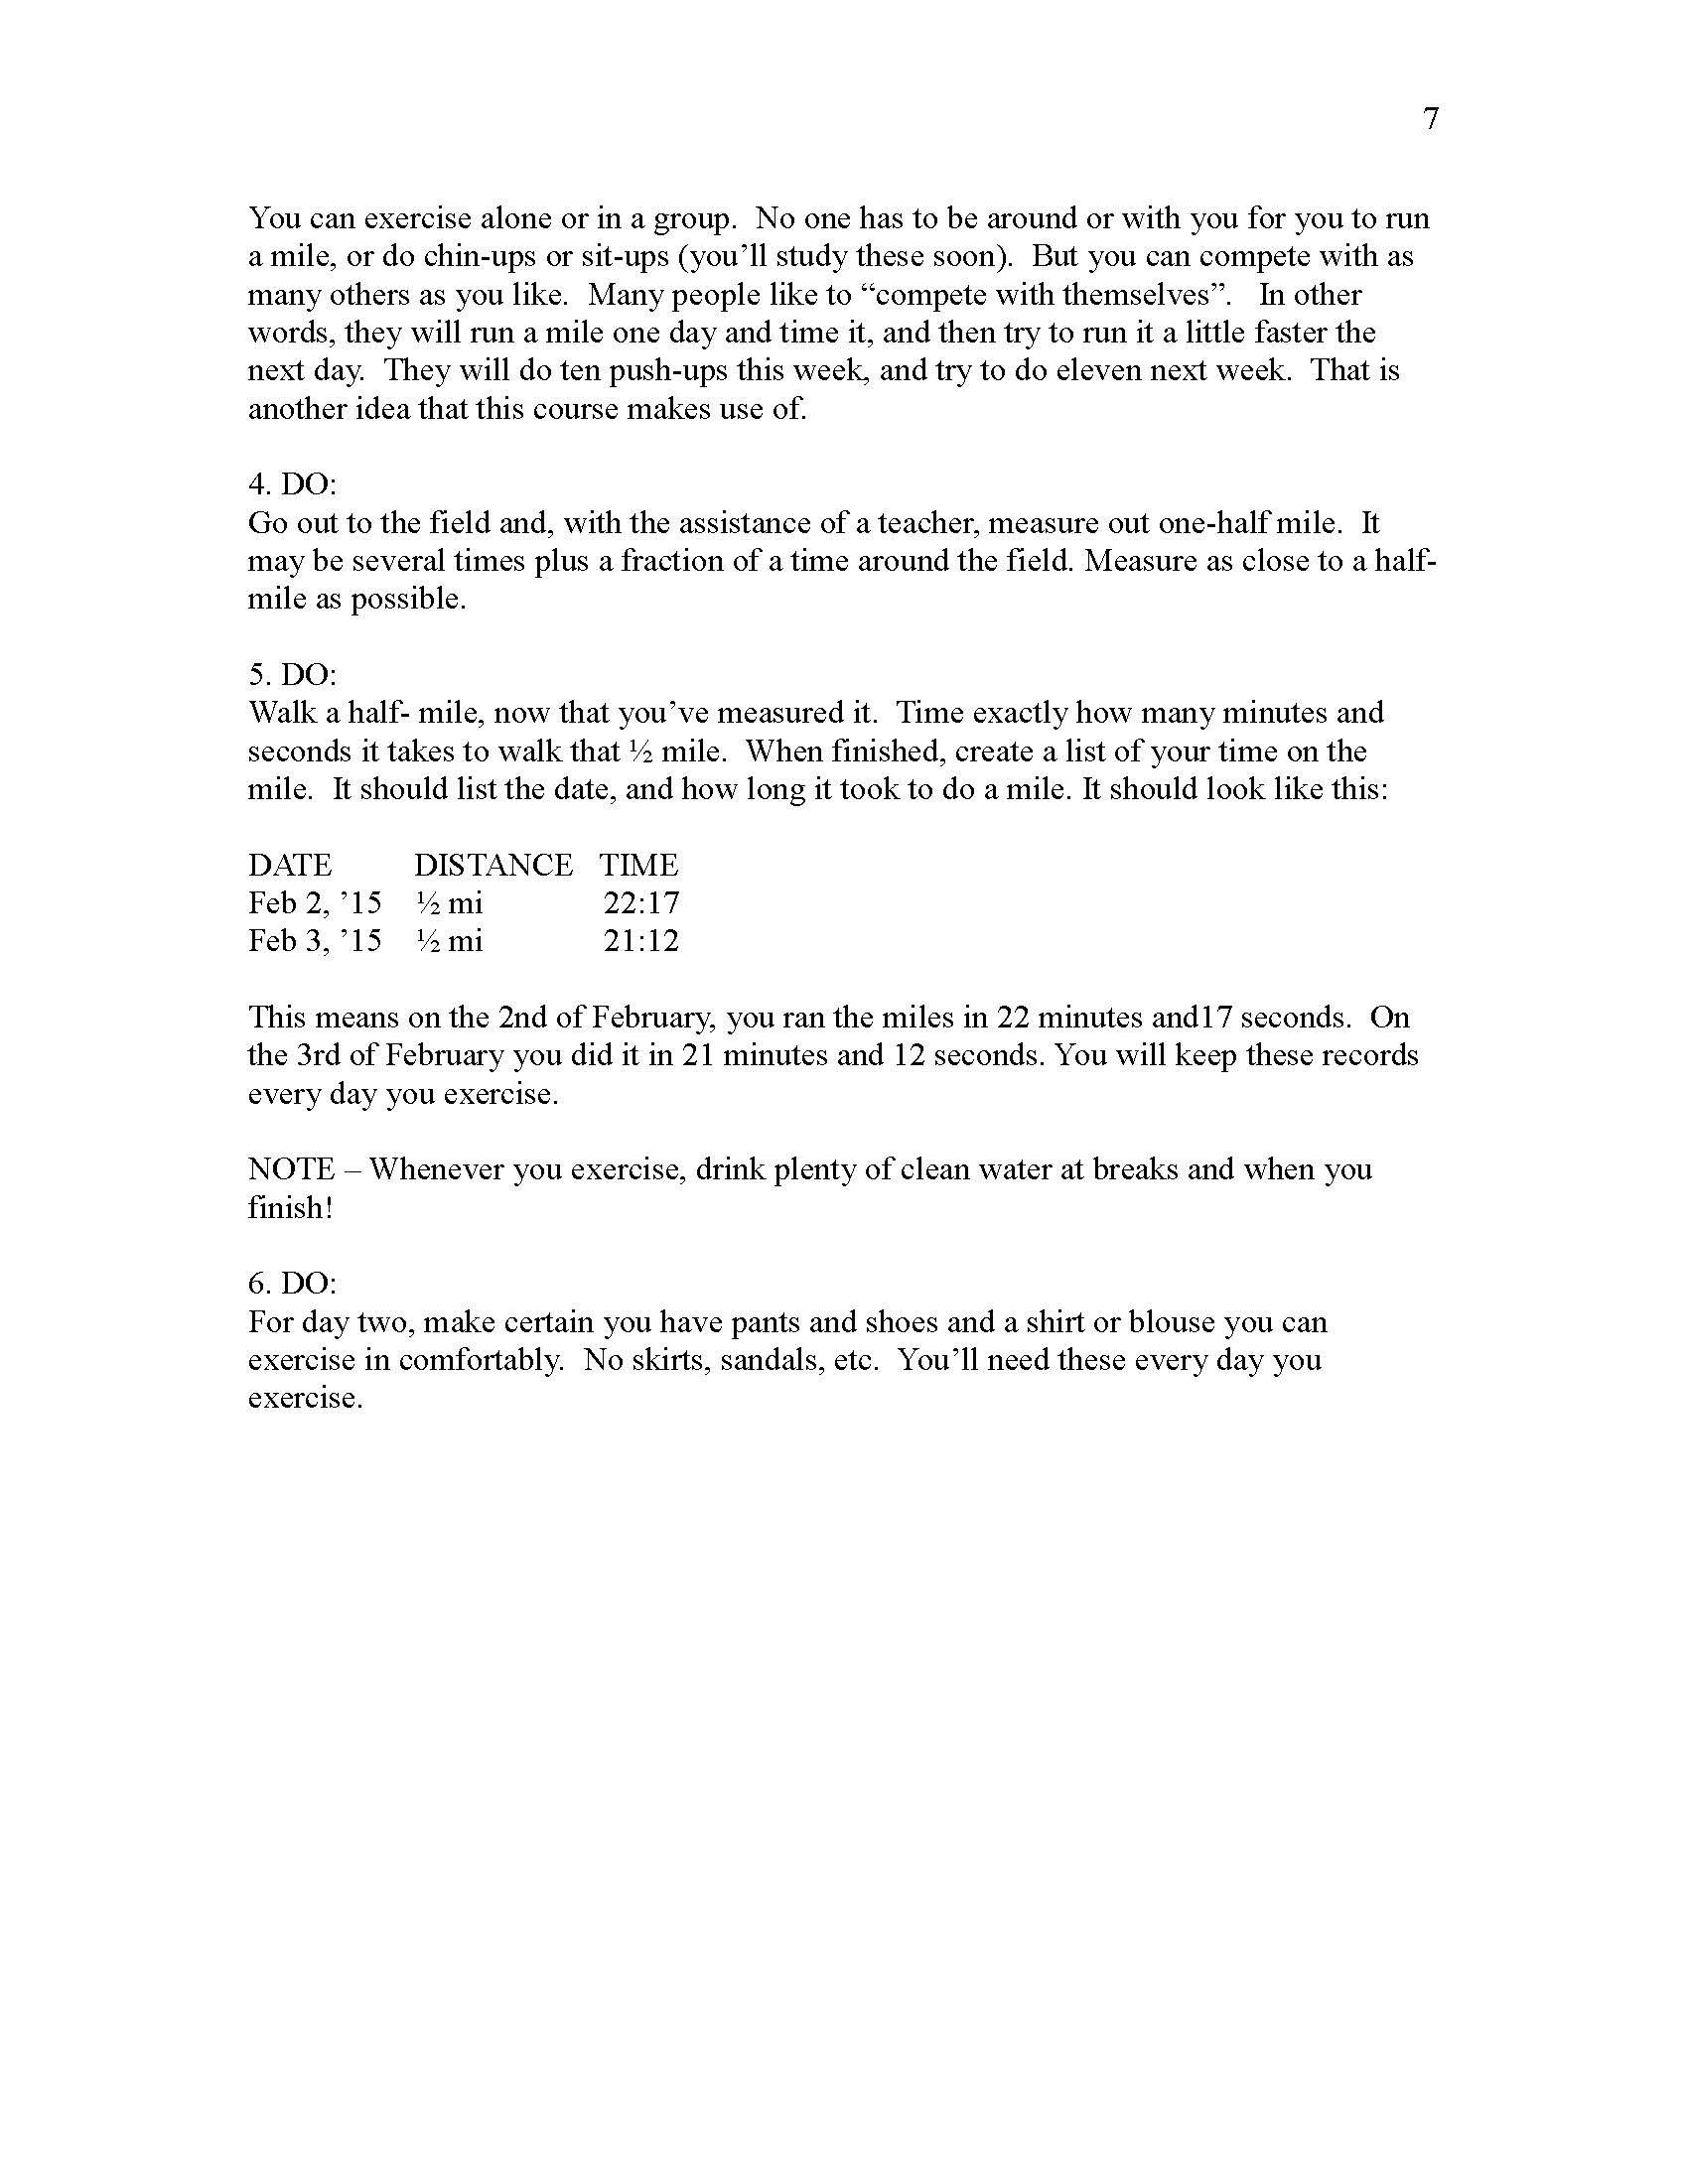 Samples STEP 2-3-4 Exercise Basics_Page_08.jpg